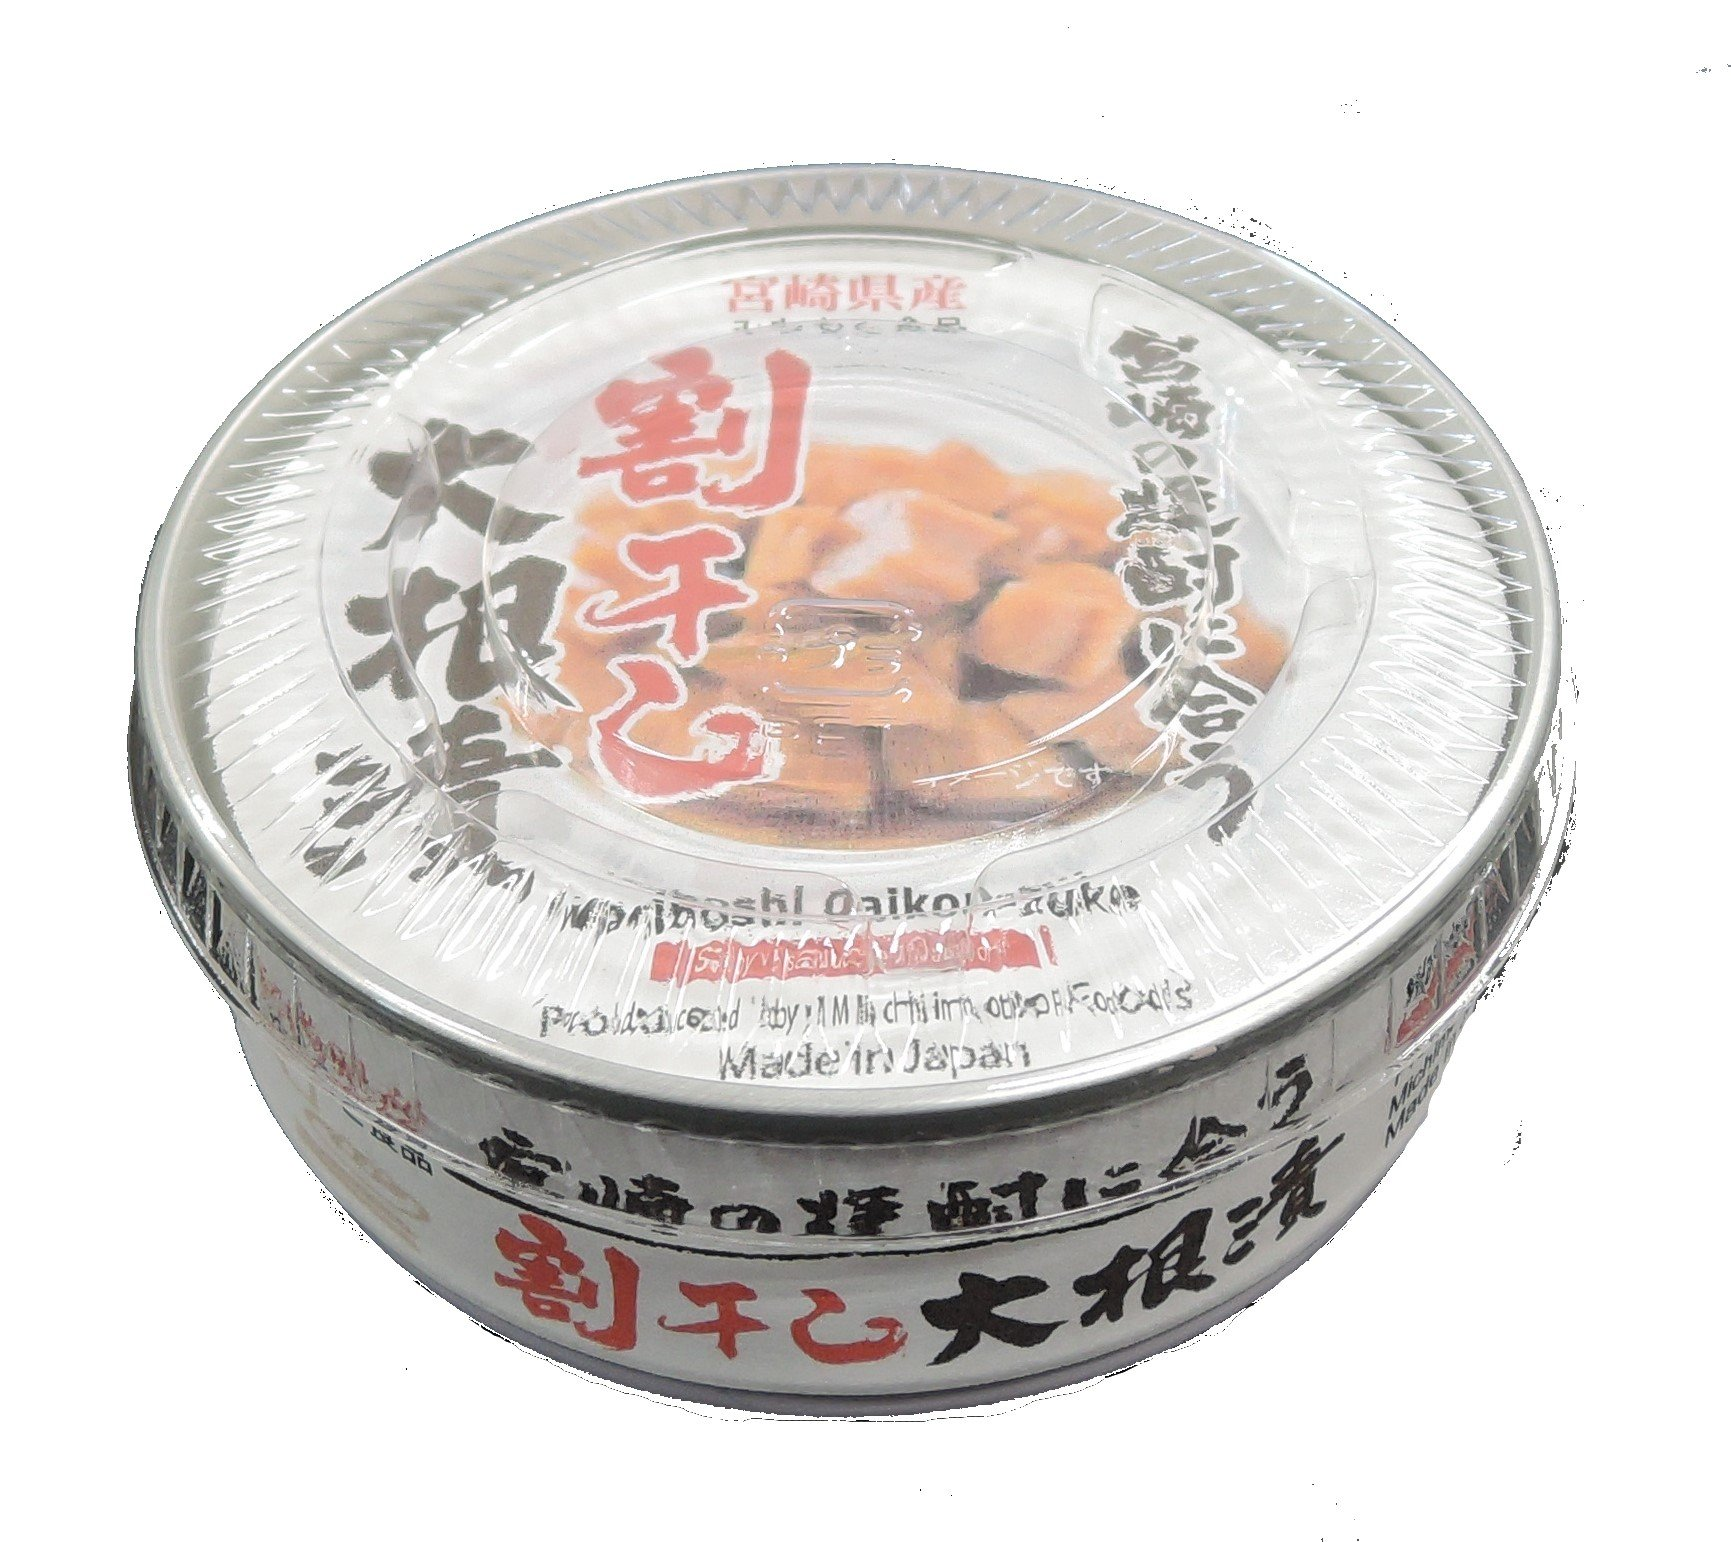 Dried radish pickles 70gX8 pieces spite of fit in Dohon food Miyazaki shochu by Dohon food